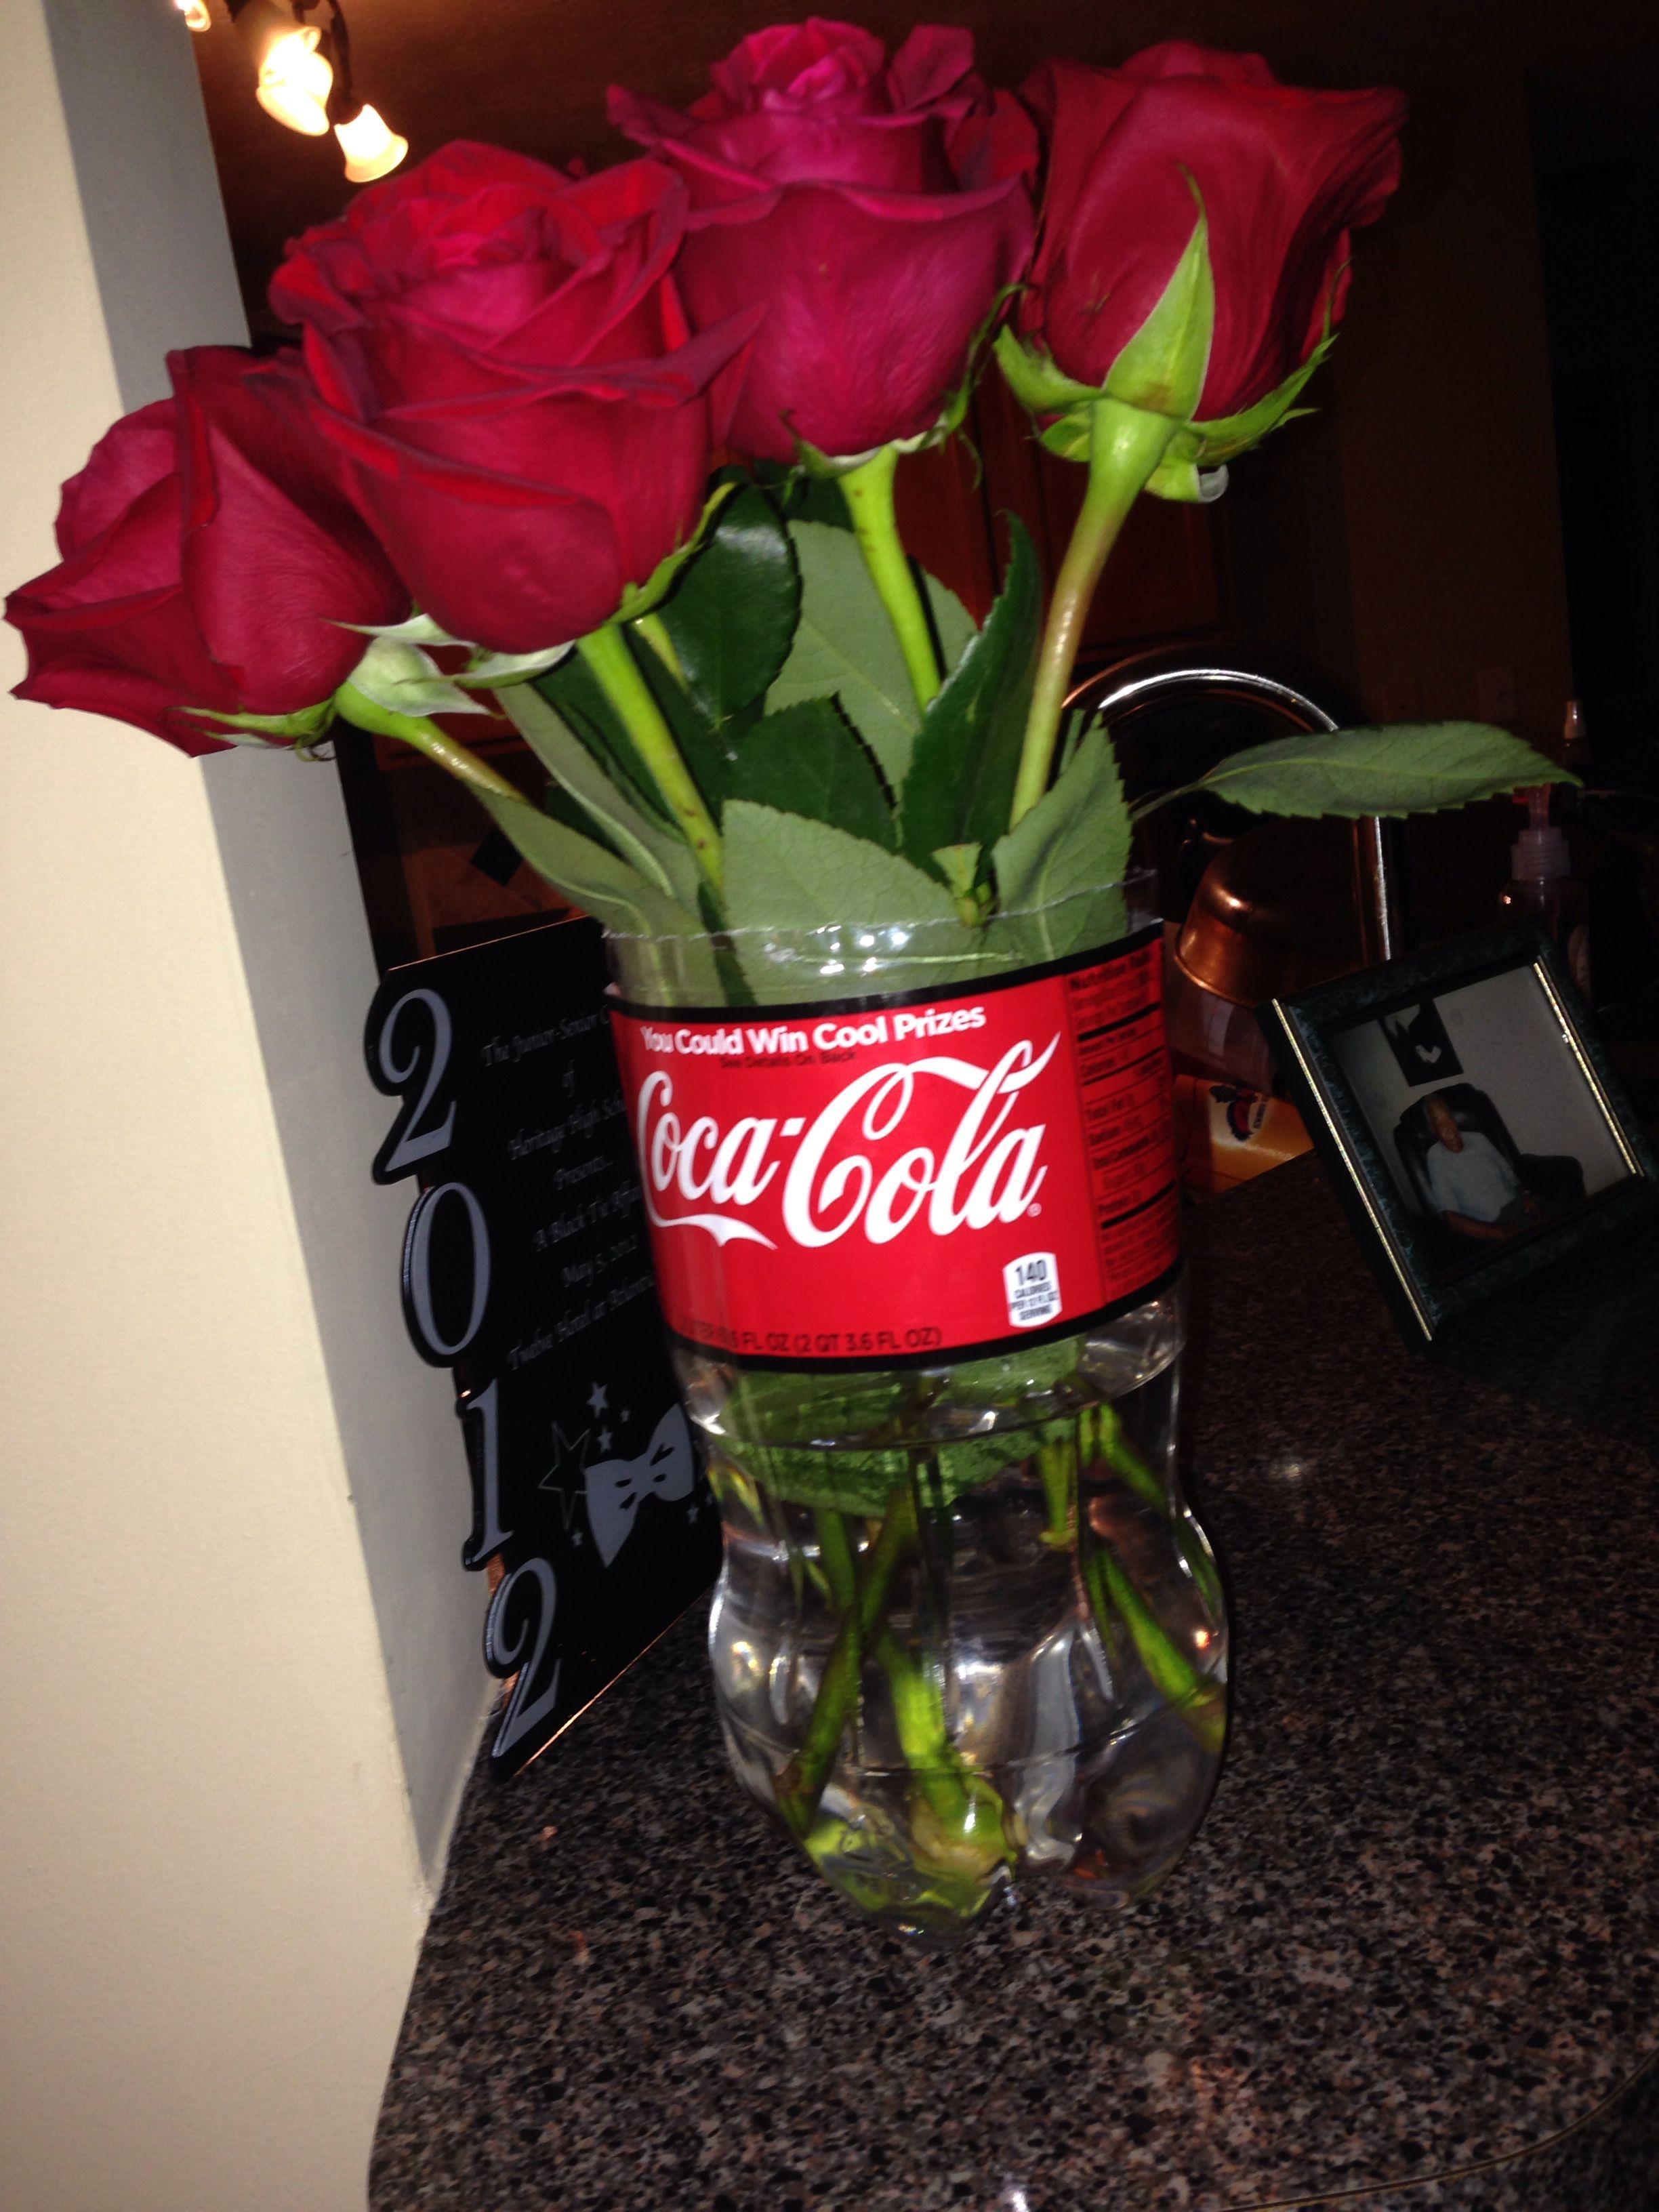 Coke bottle vas